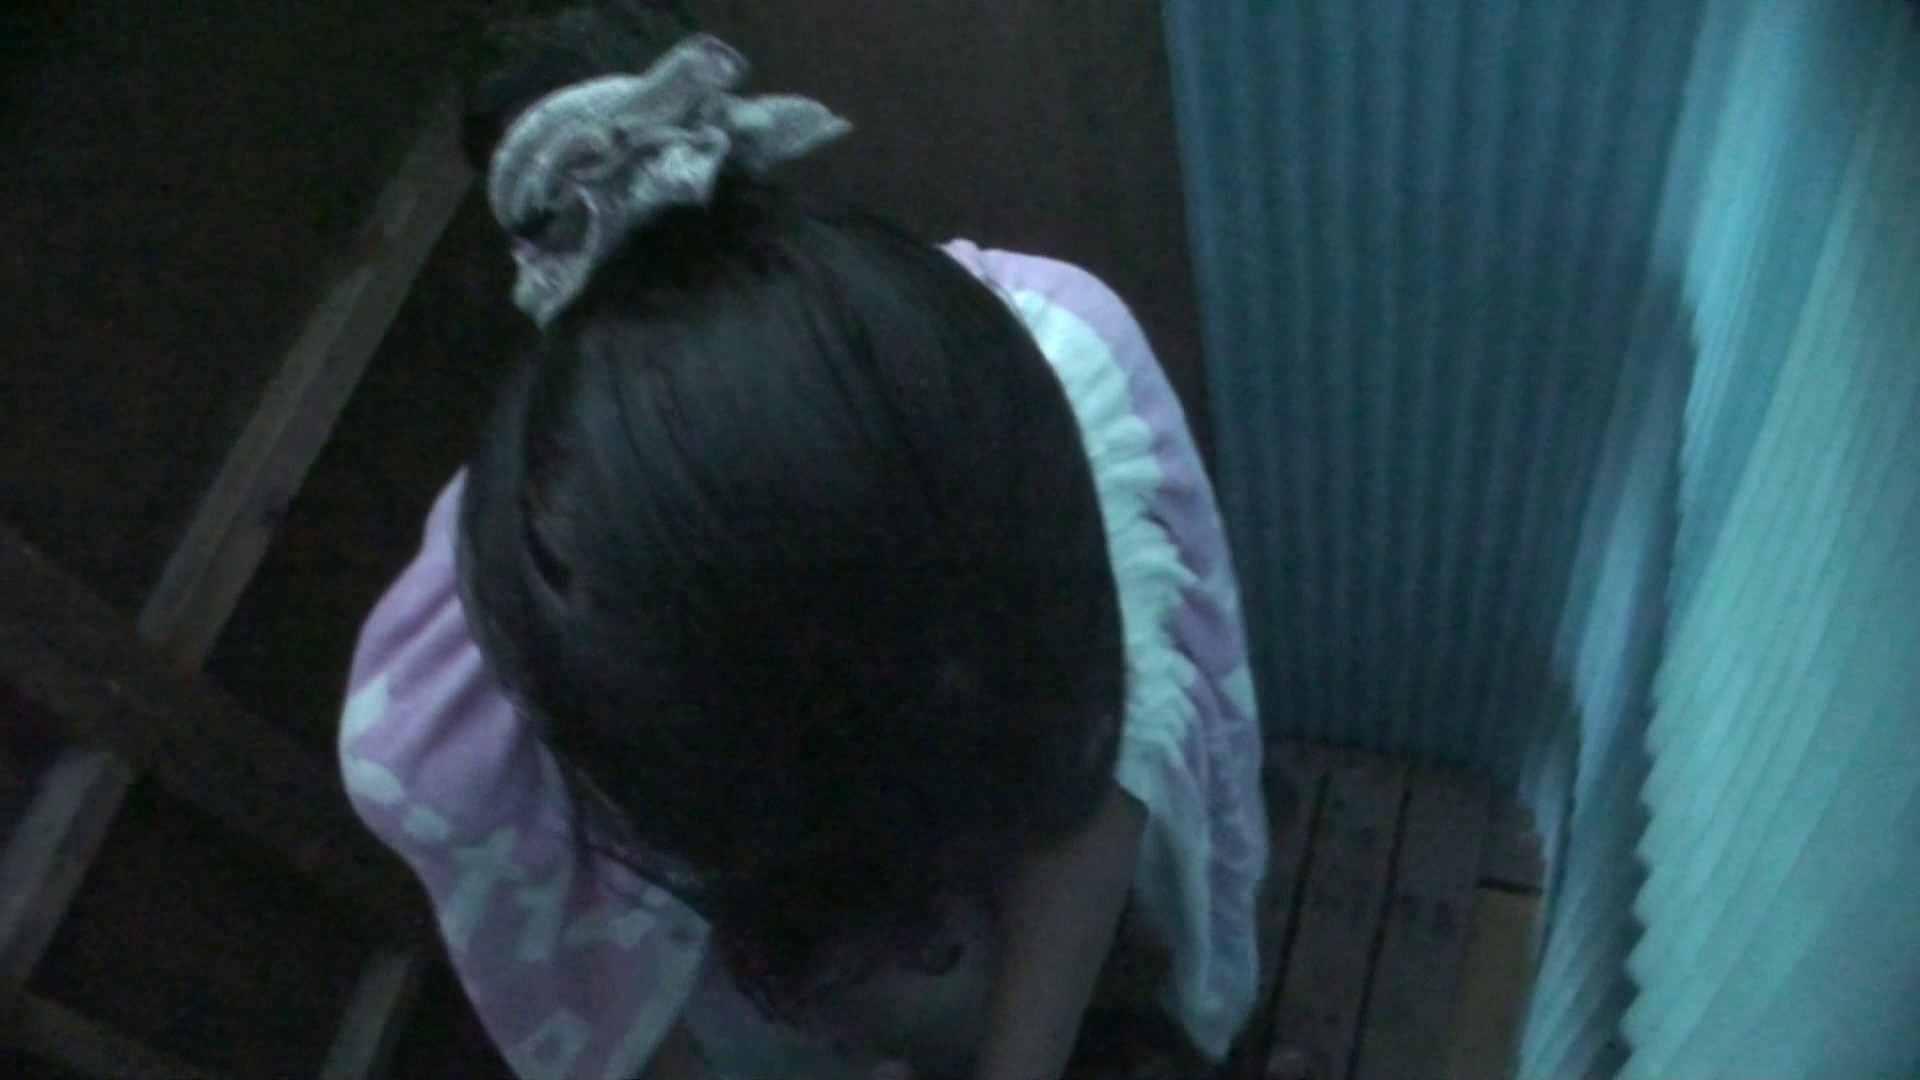 Vol.26 大学生風美形ギャル 暗さが残念! 盗撮編 オメコ無修正動画無料 110枚 60